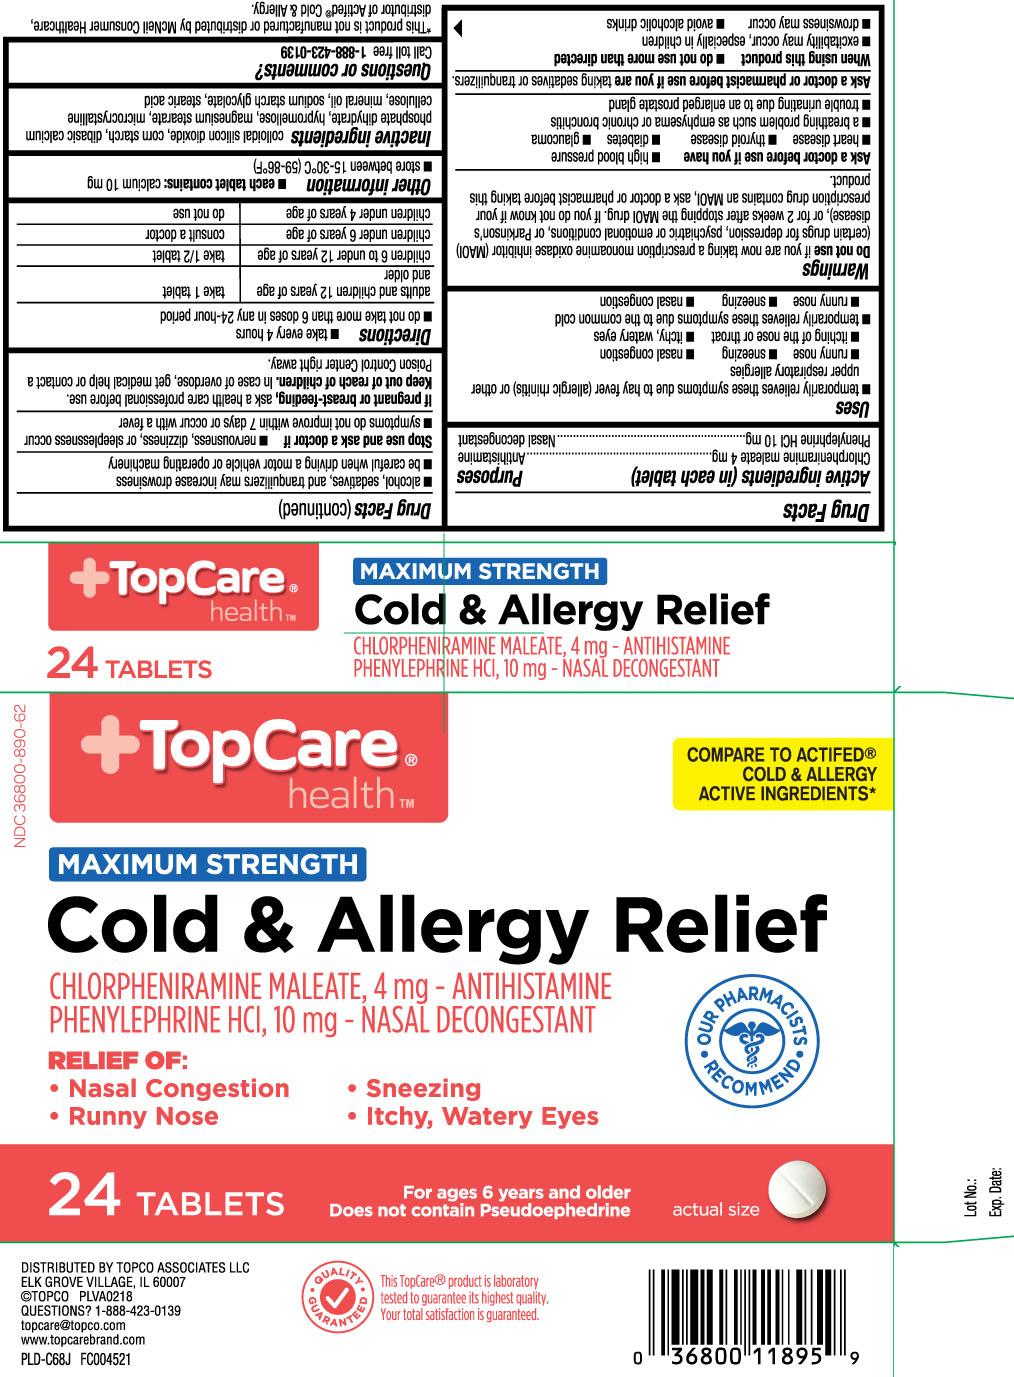 Chlorpheniramine maleate 4 mg, Phenylephrine HCI 10 mg